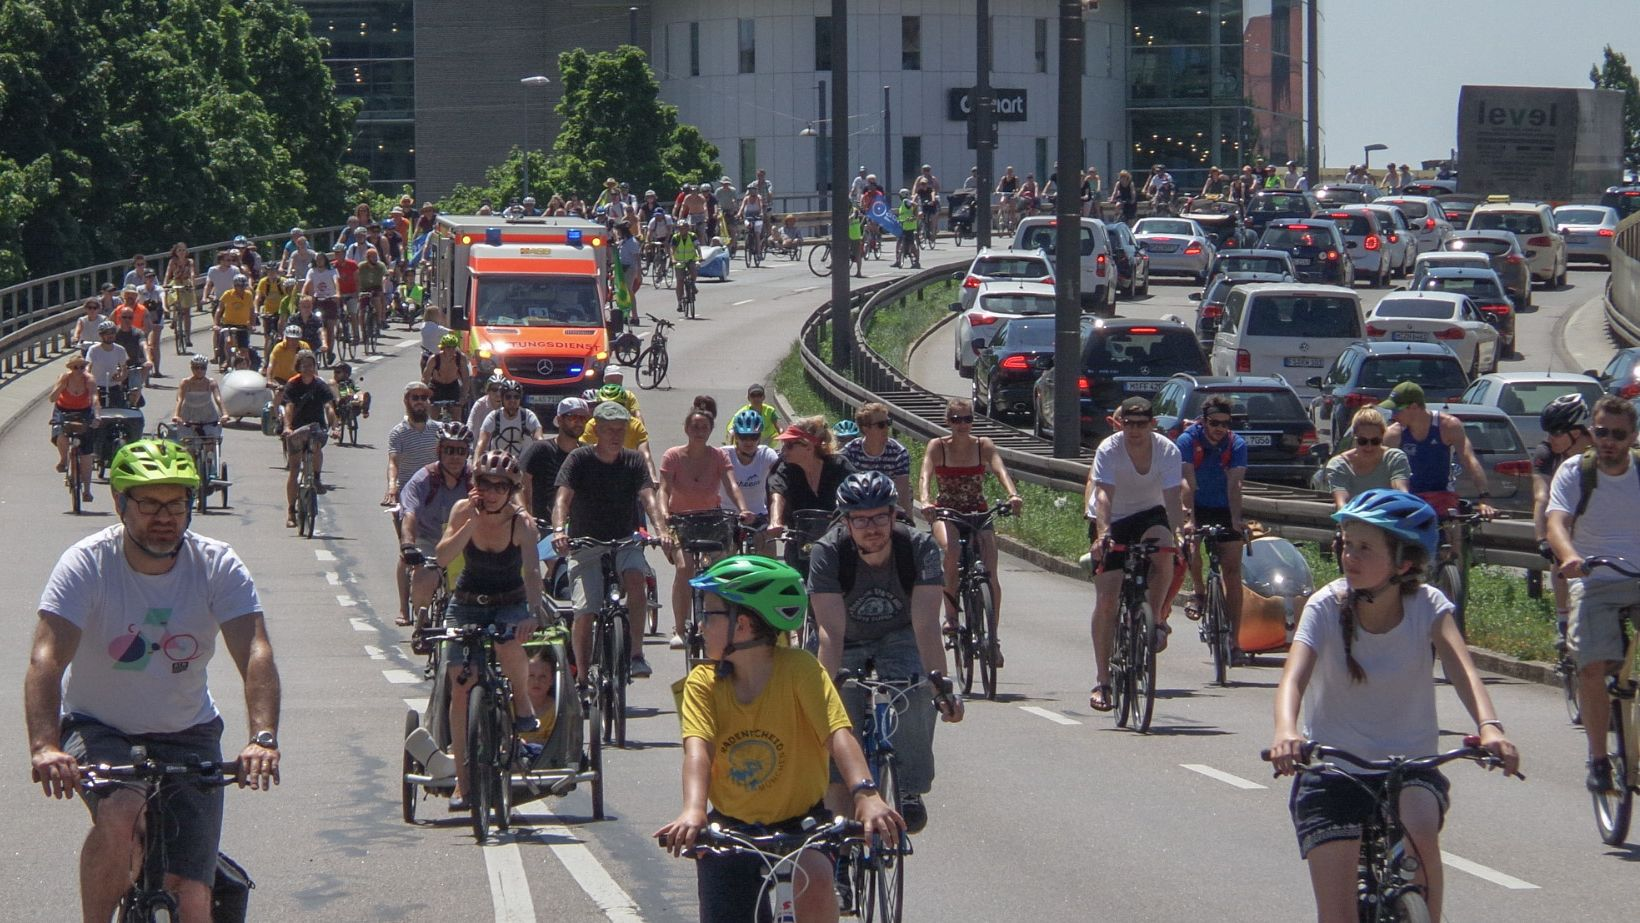 Rad-Ring-Demo in München am 30.06.2019.